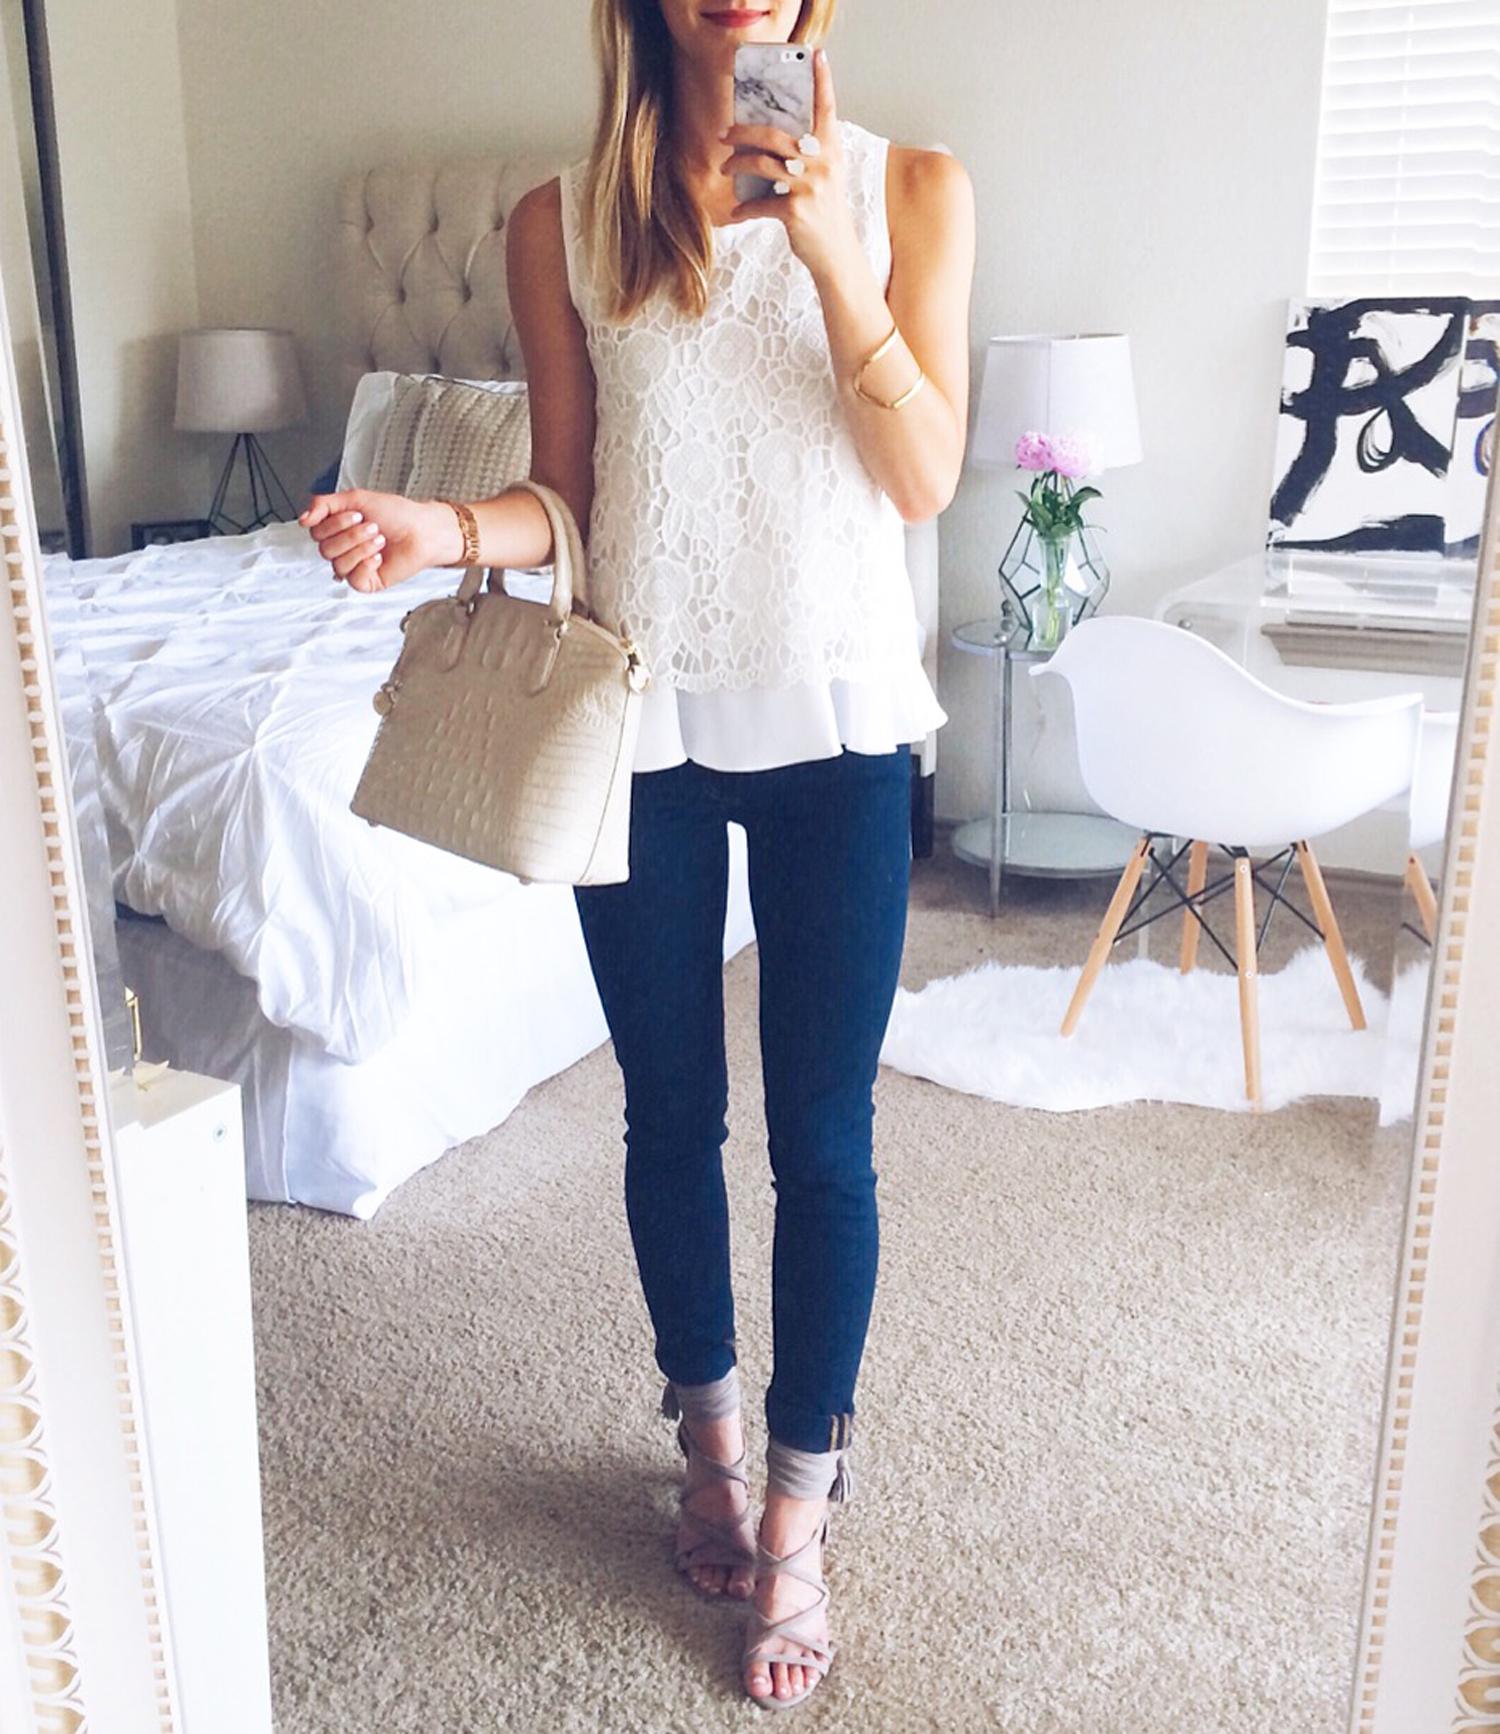 livvyland-blog-olivia-watson-austin-texas-fashion-blogger-white-lace-top-selfie-jeffrey-campbell-despina-heels-brahmin-duxbury-cava